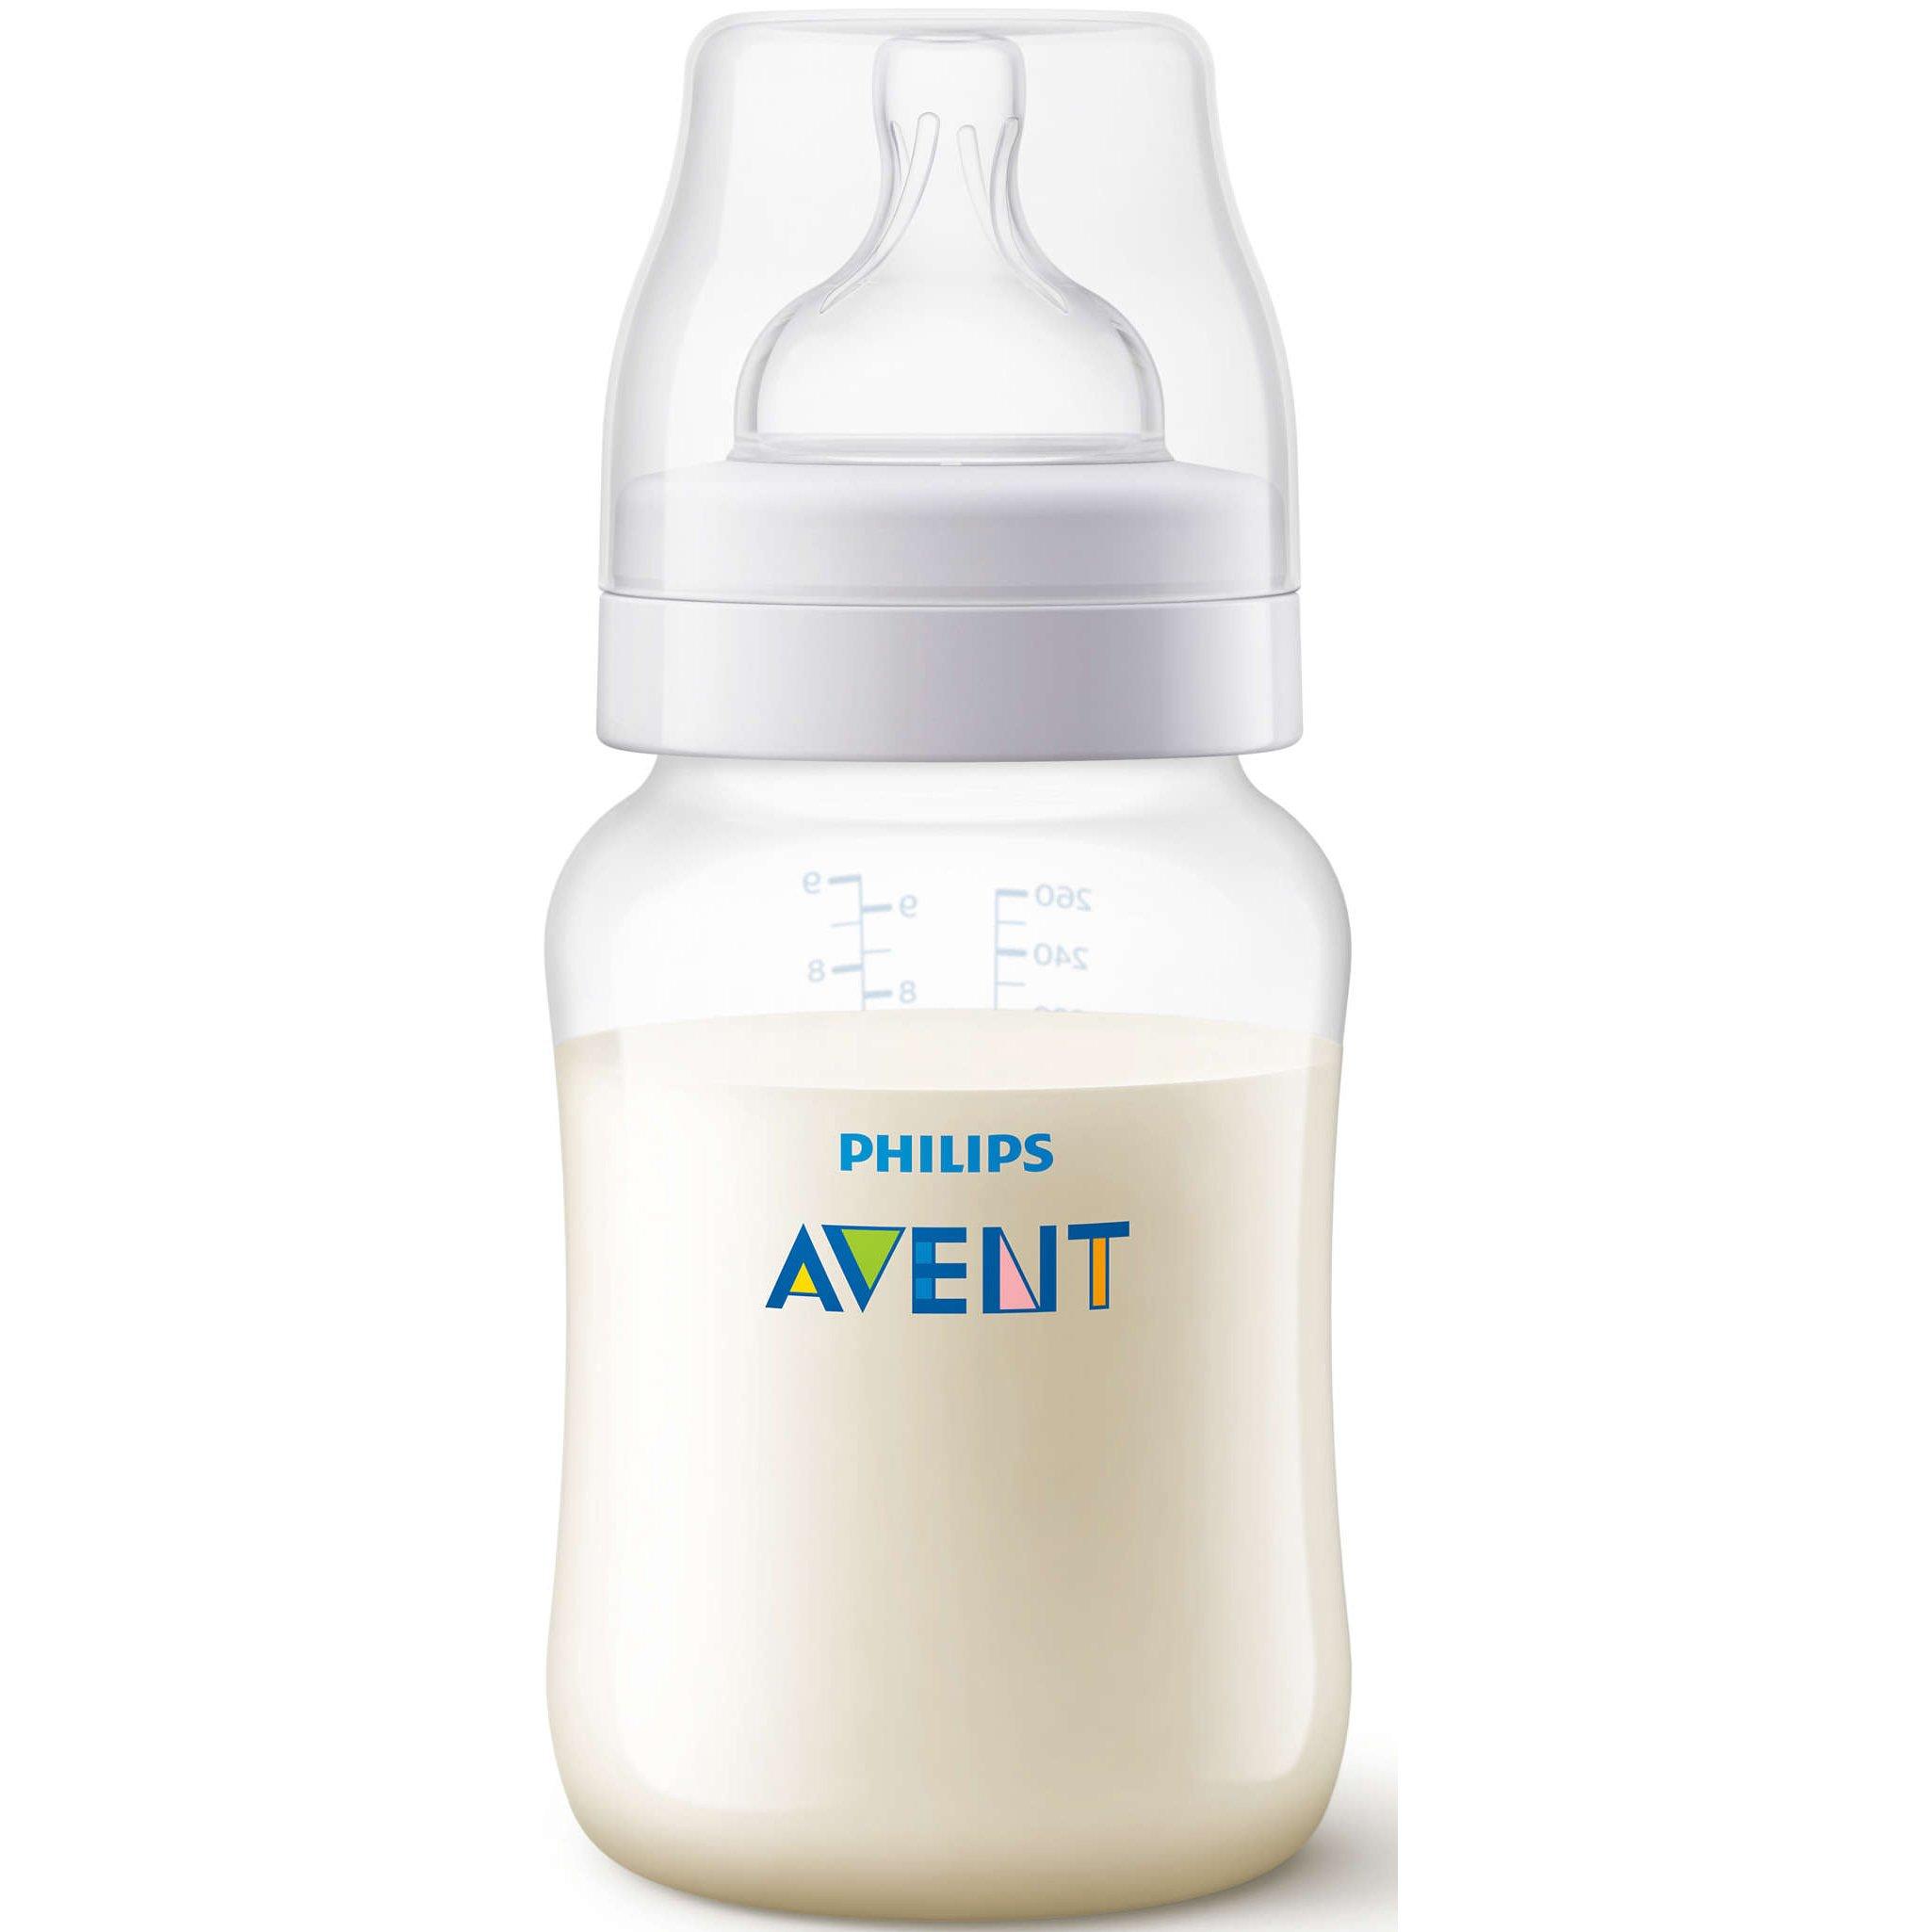 Philips Avent Anti-Colic Μπιμπερό Θηλή Σιλικόνης Αργής Ροής Κατά των Κολικών & της Δυσφορίας, από 1 Μηνών,0% BPA 260ml SCF813/17